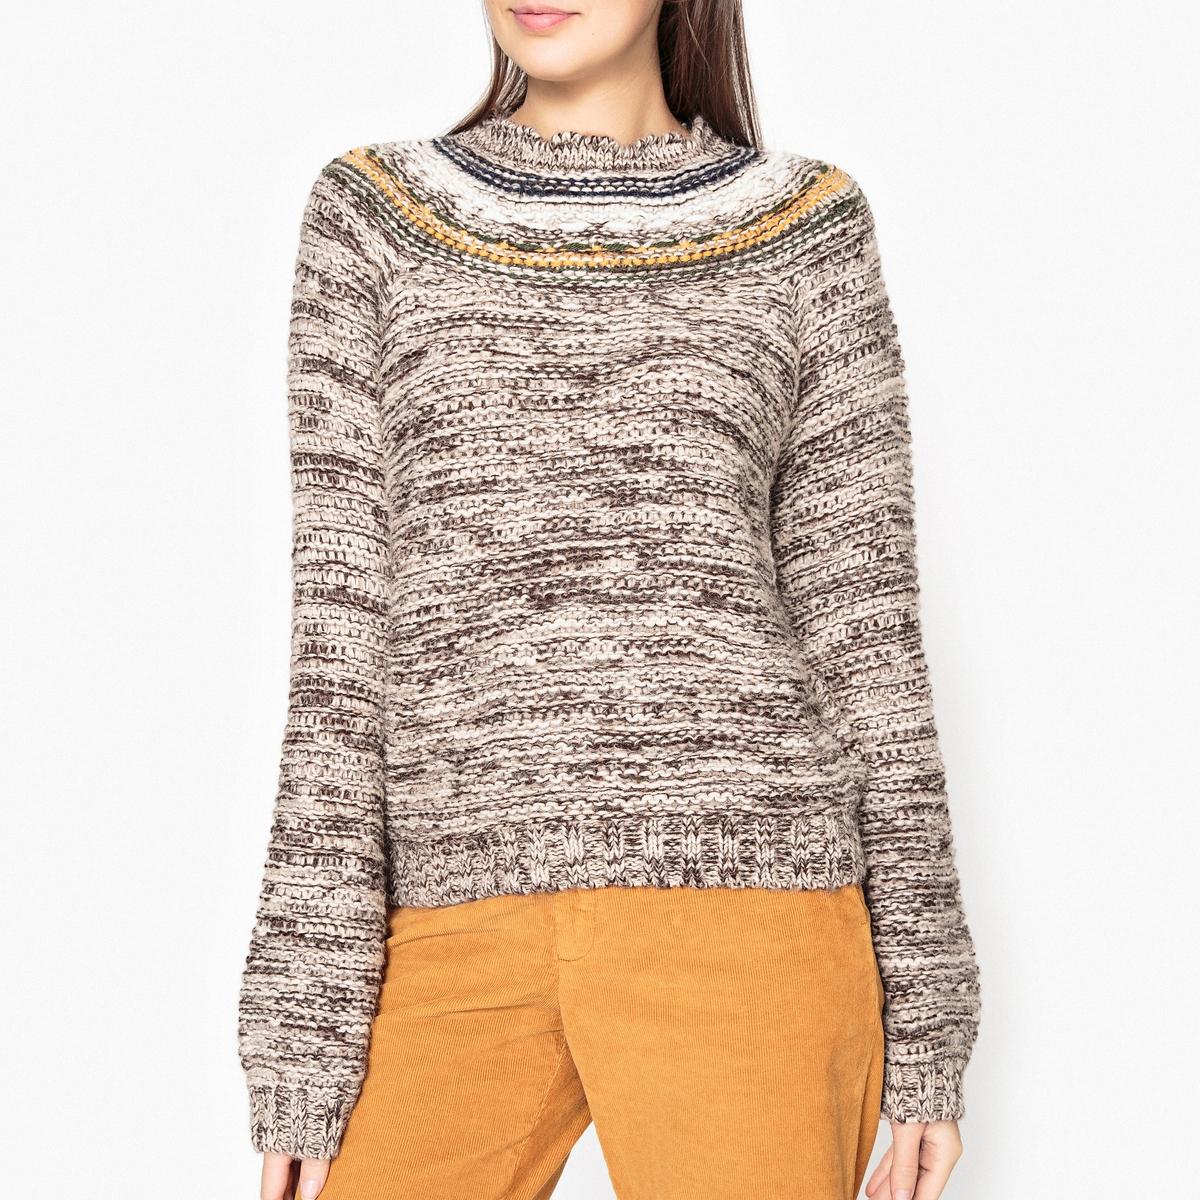 Пуловер из плотного трикотажа MAYONESSA